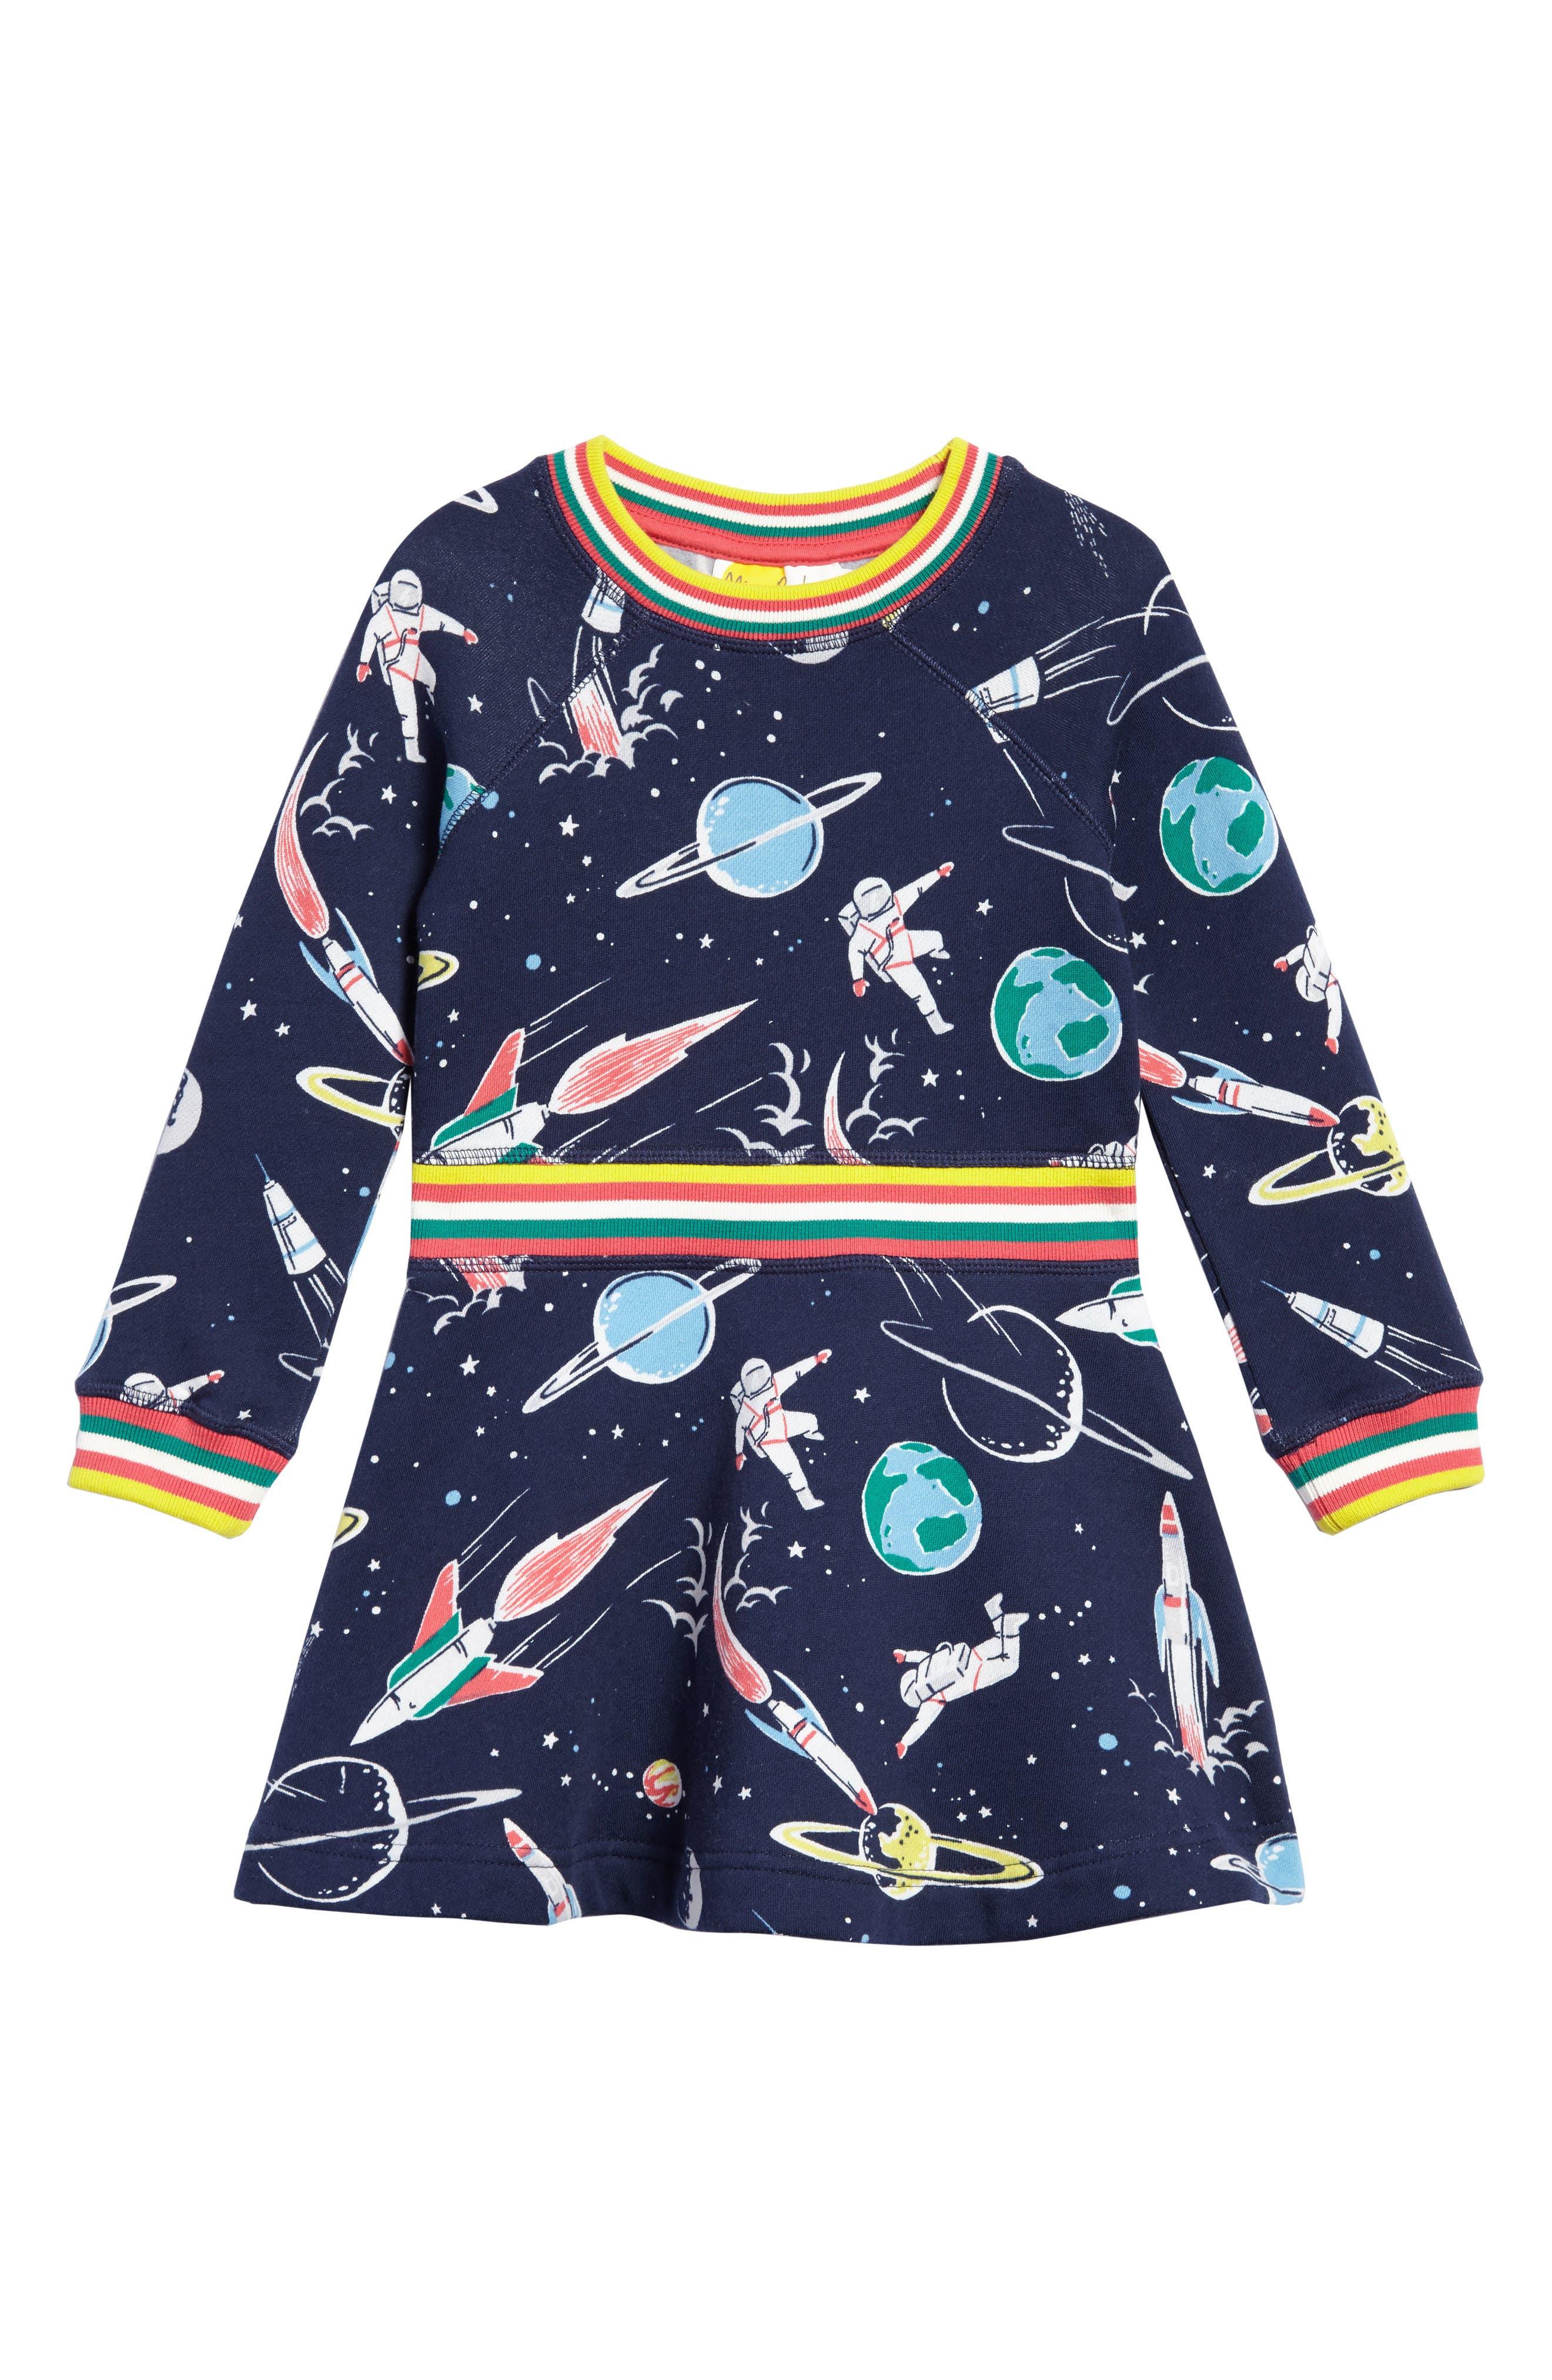 Space Sweatshirt Dress,                             Main thumbnail 1, color,                             School Navy Space